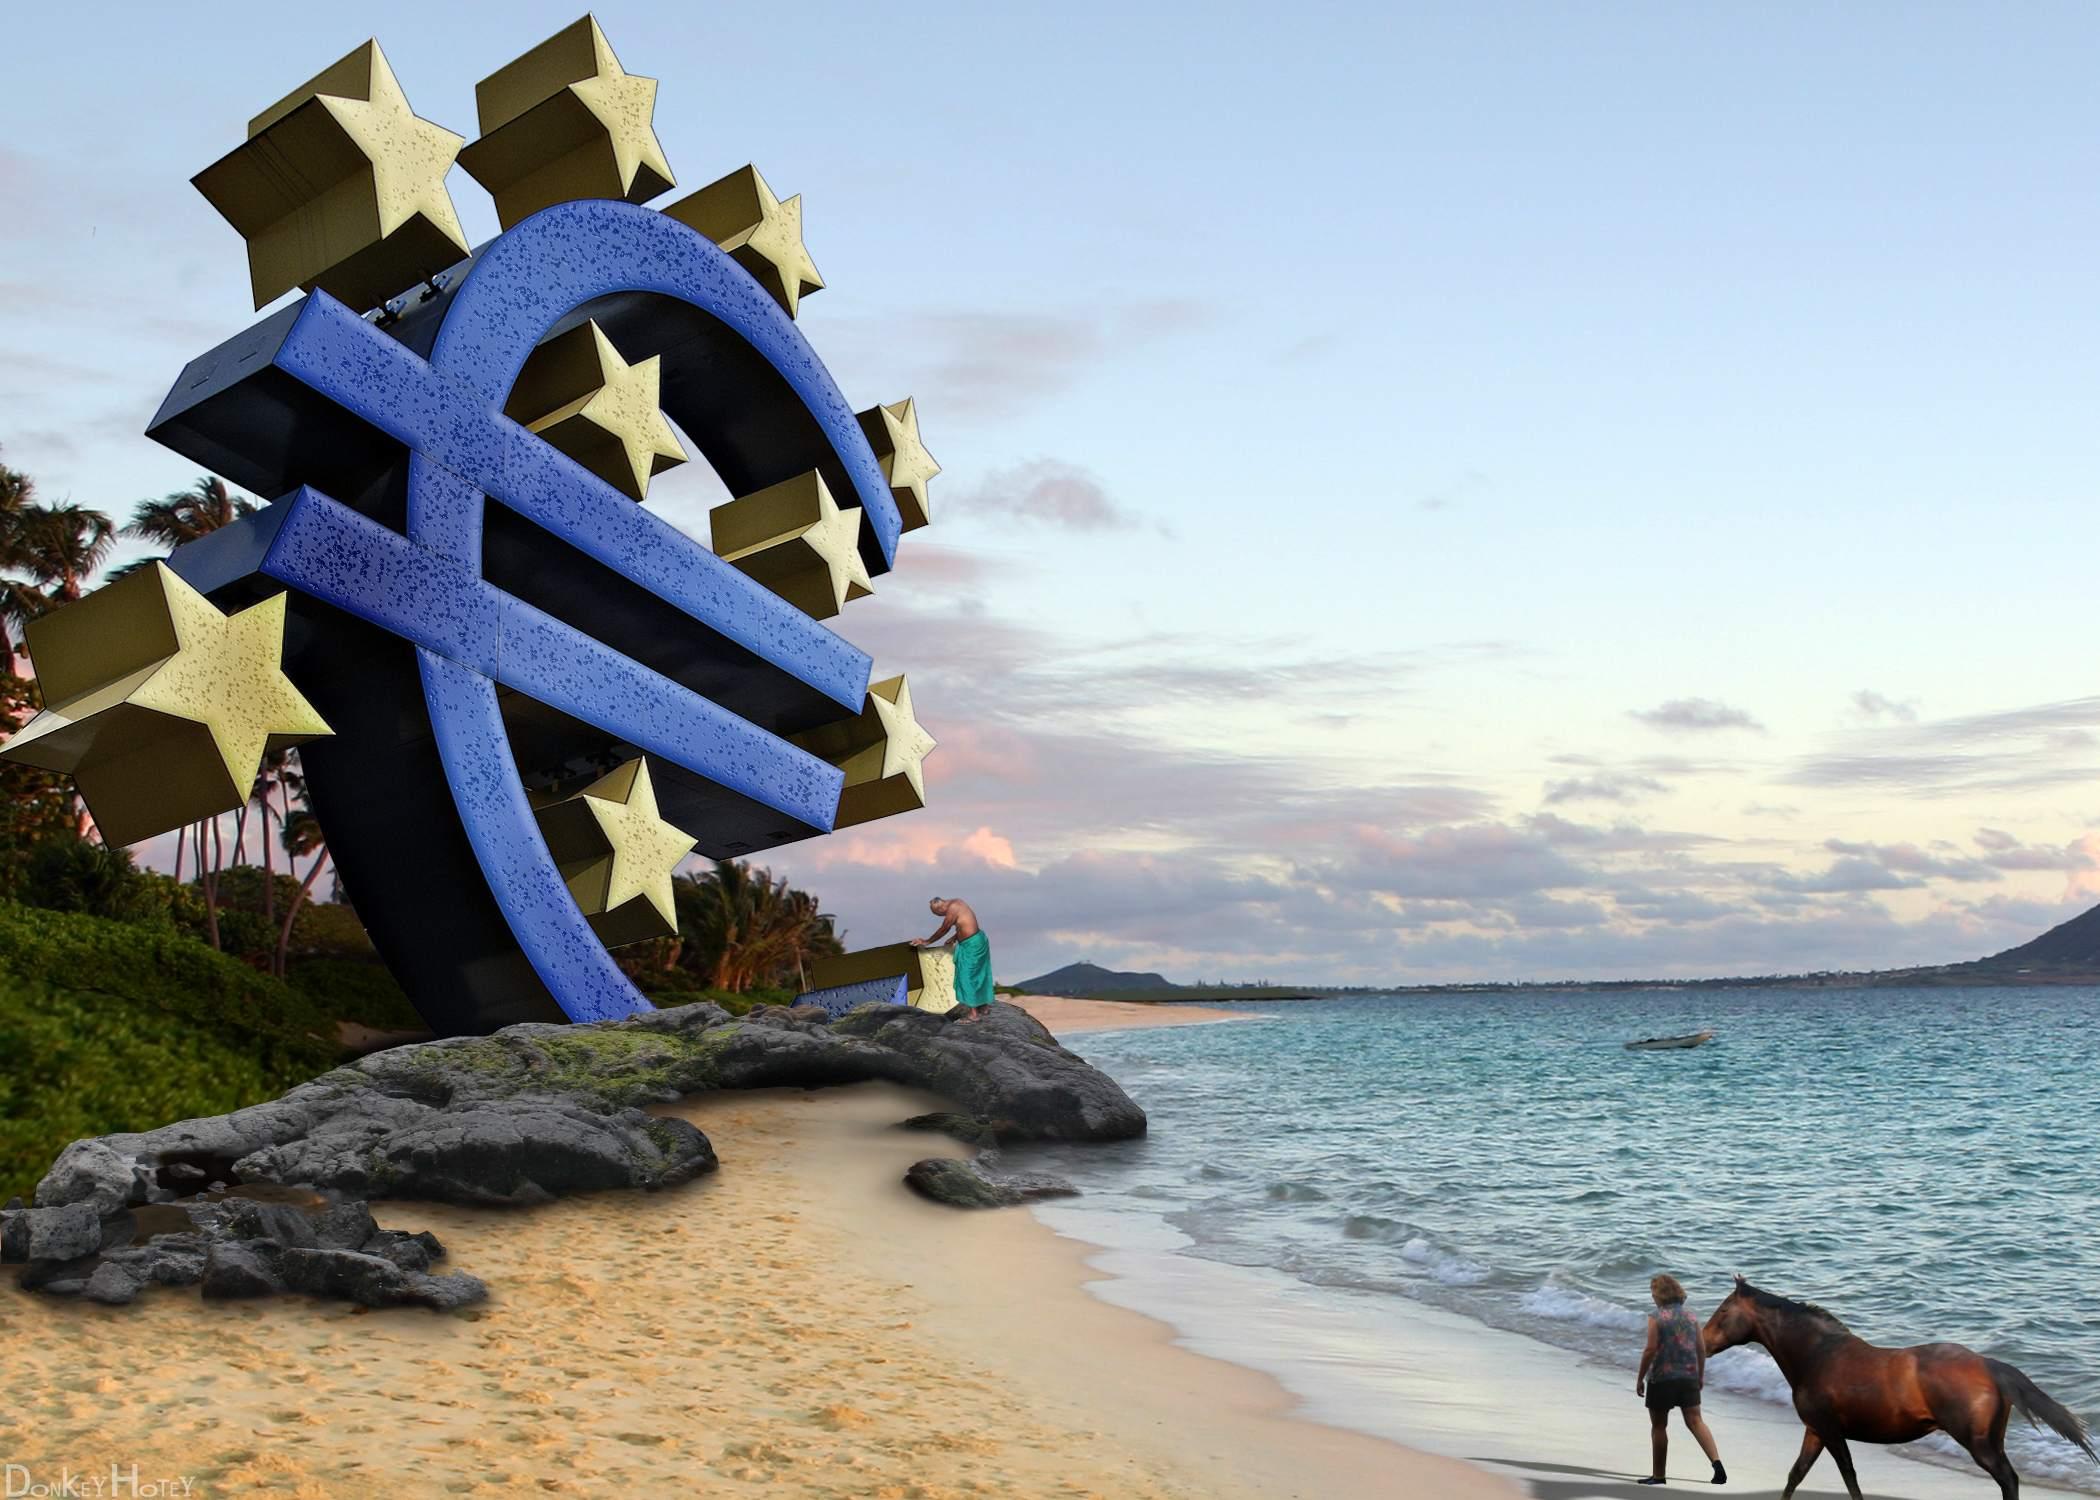 EZB Cartoon